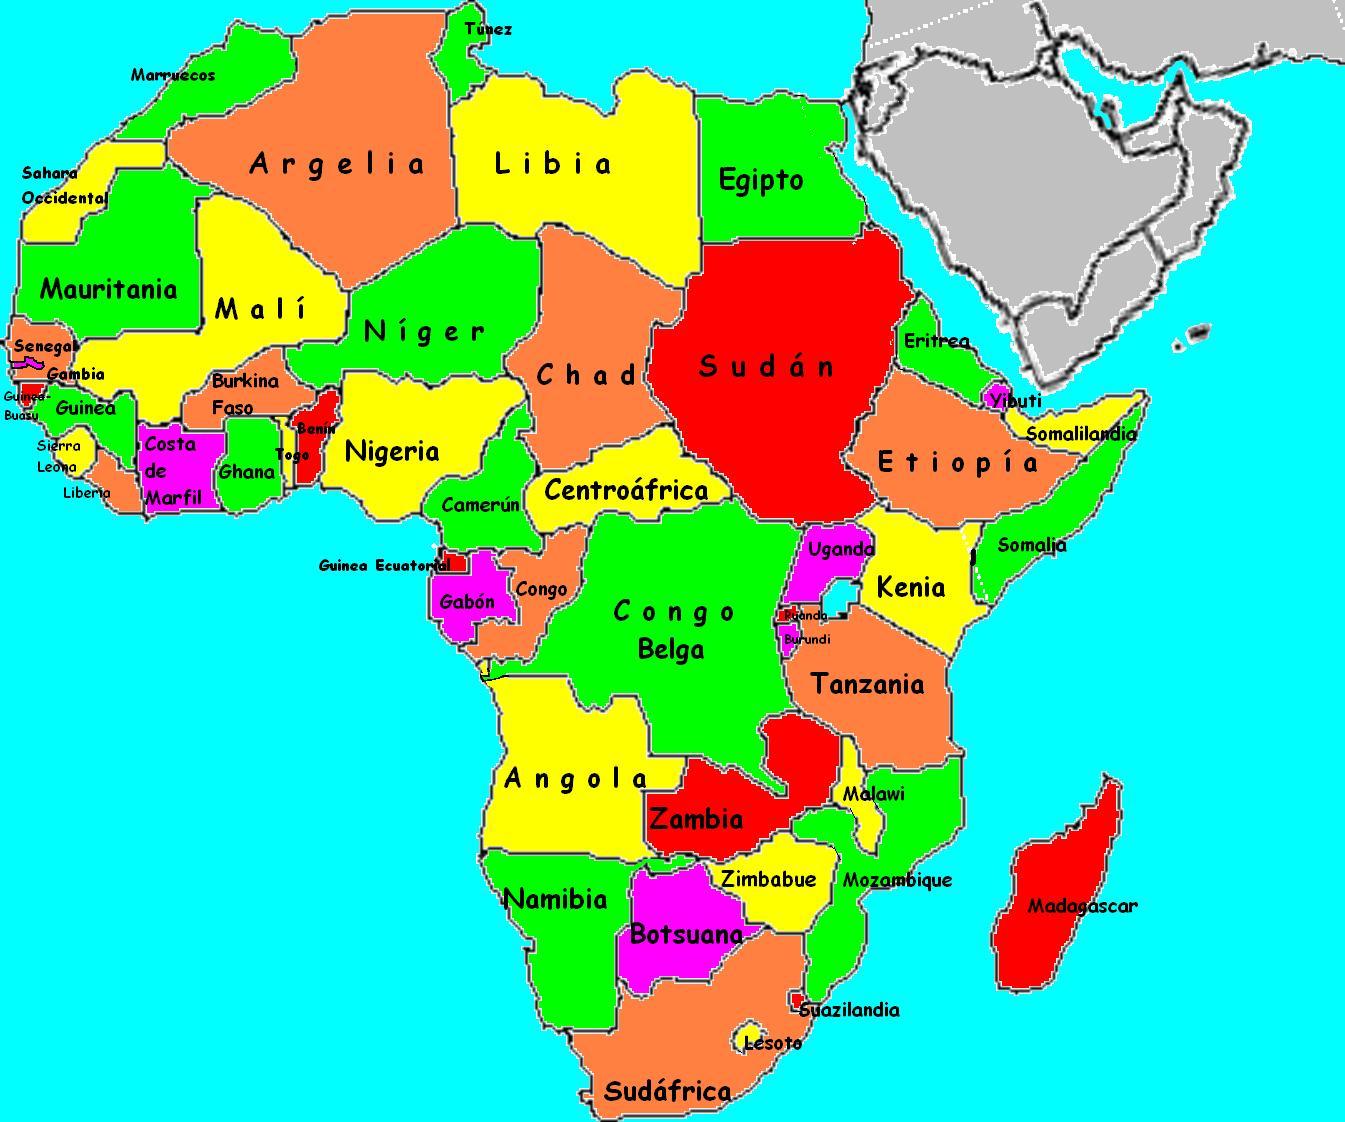 Paises De Africa Mapa Interactivo.Ver El Mapa De Africa